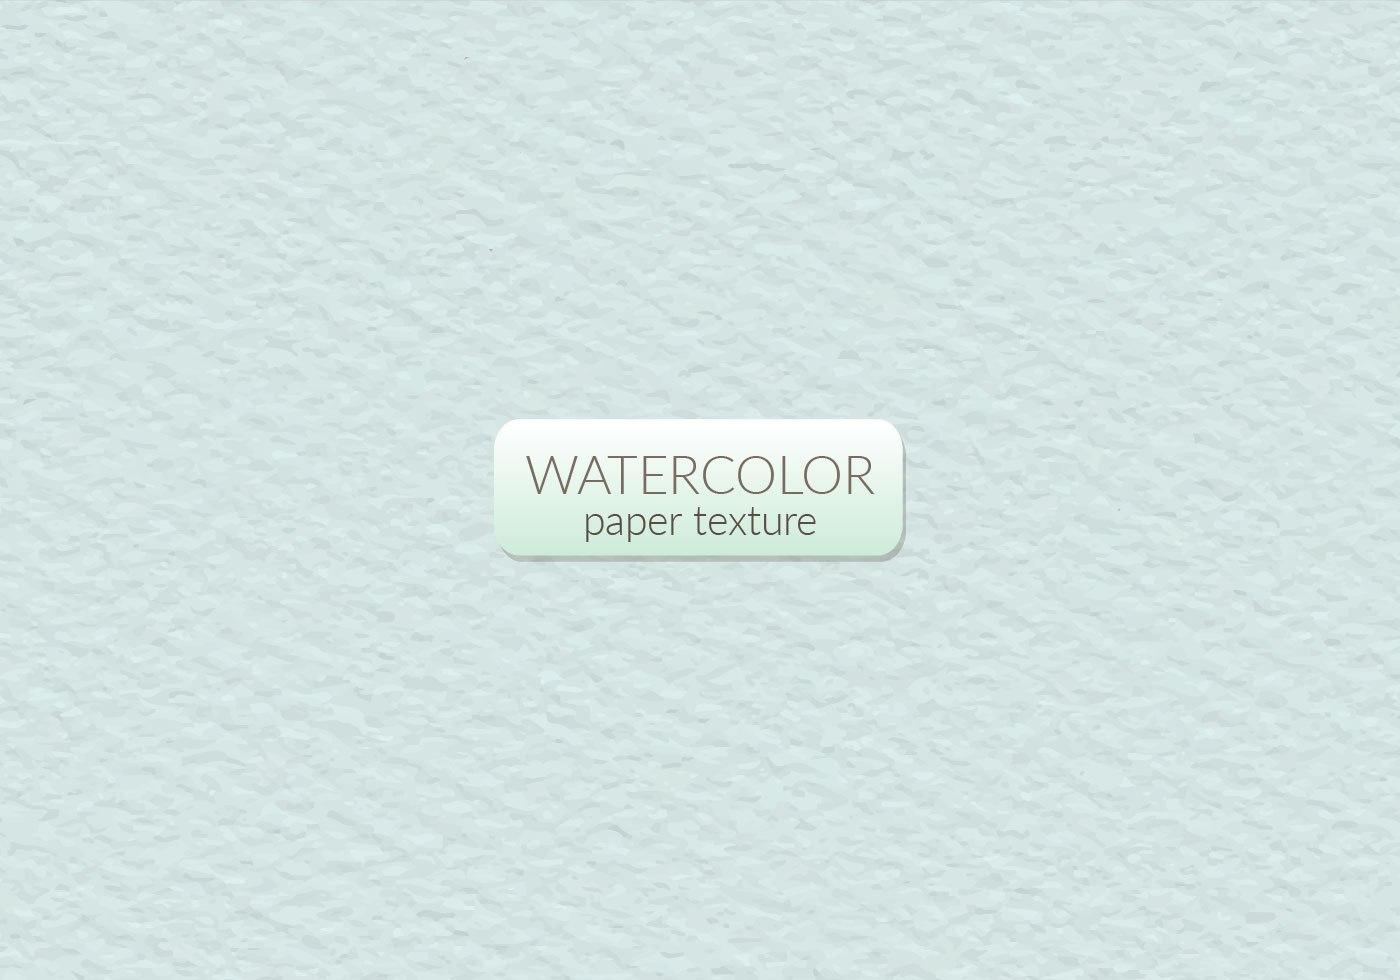 Watercolor Paper Texture - Download Free Vector Art, Stock ...